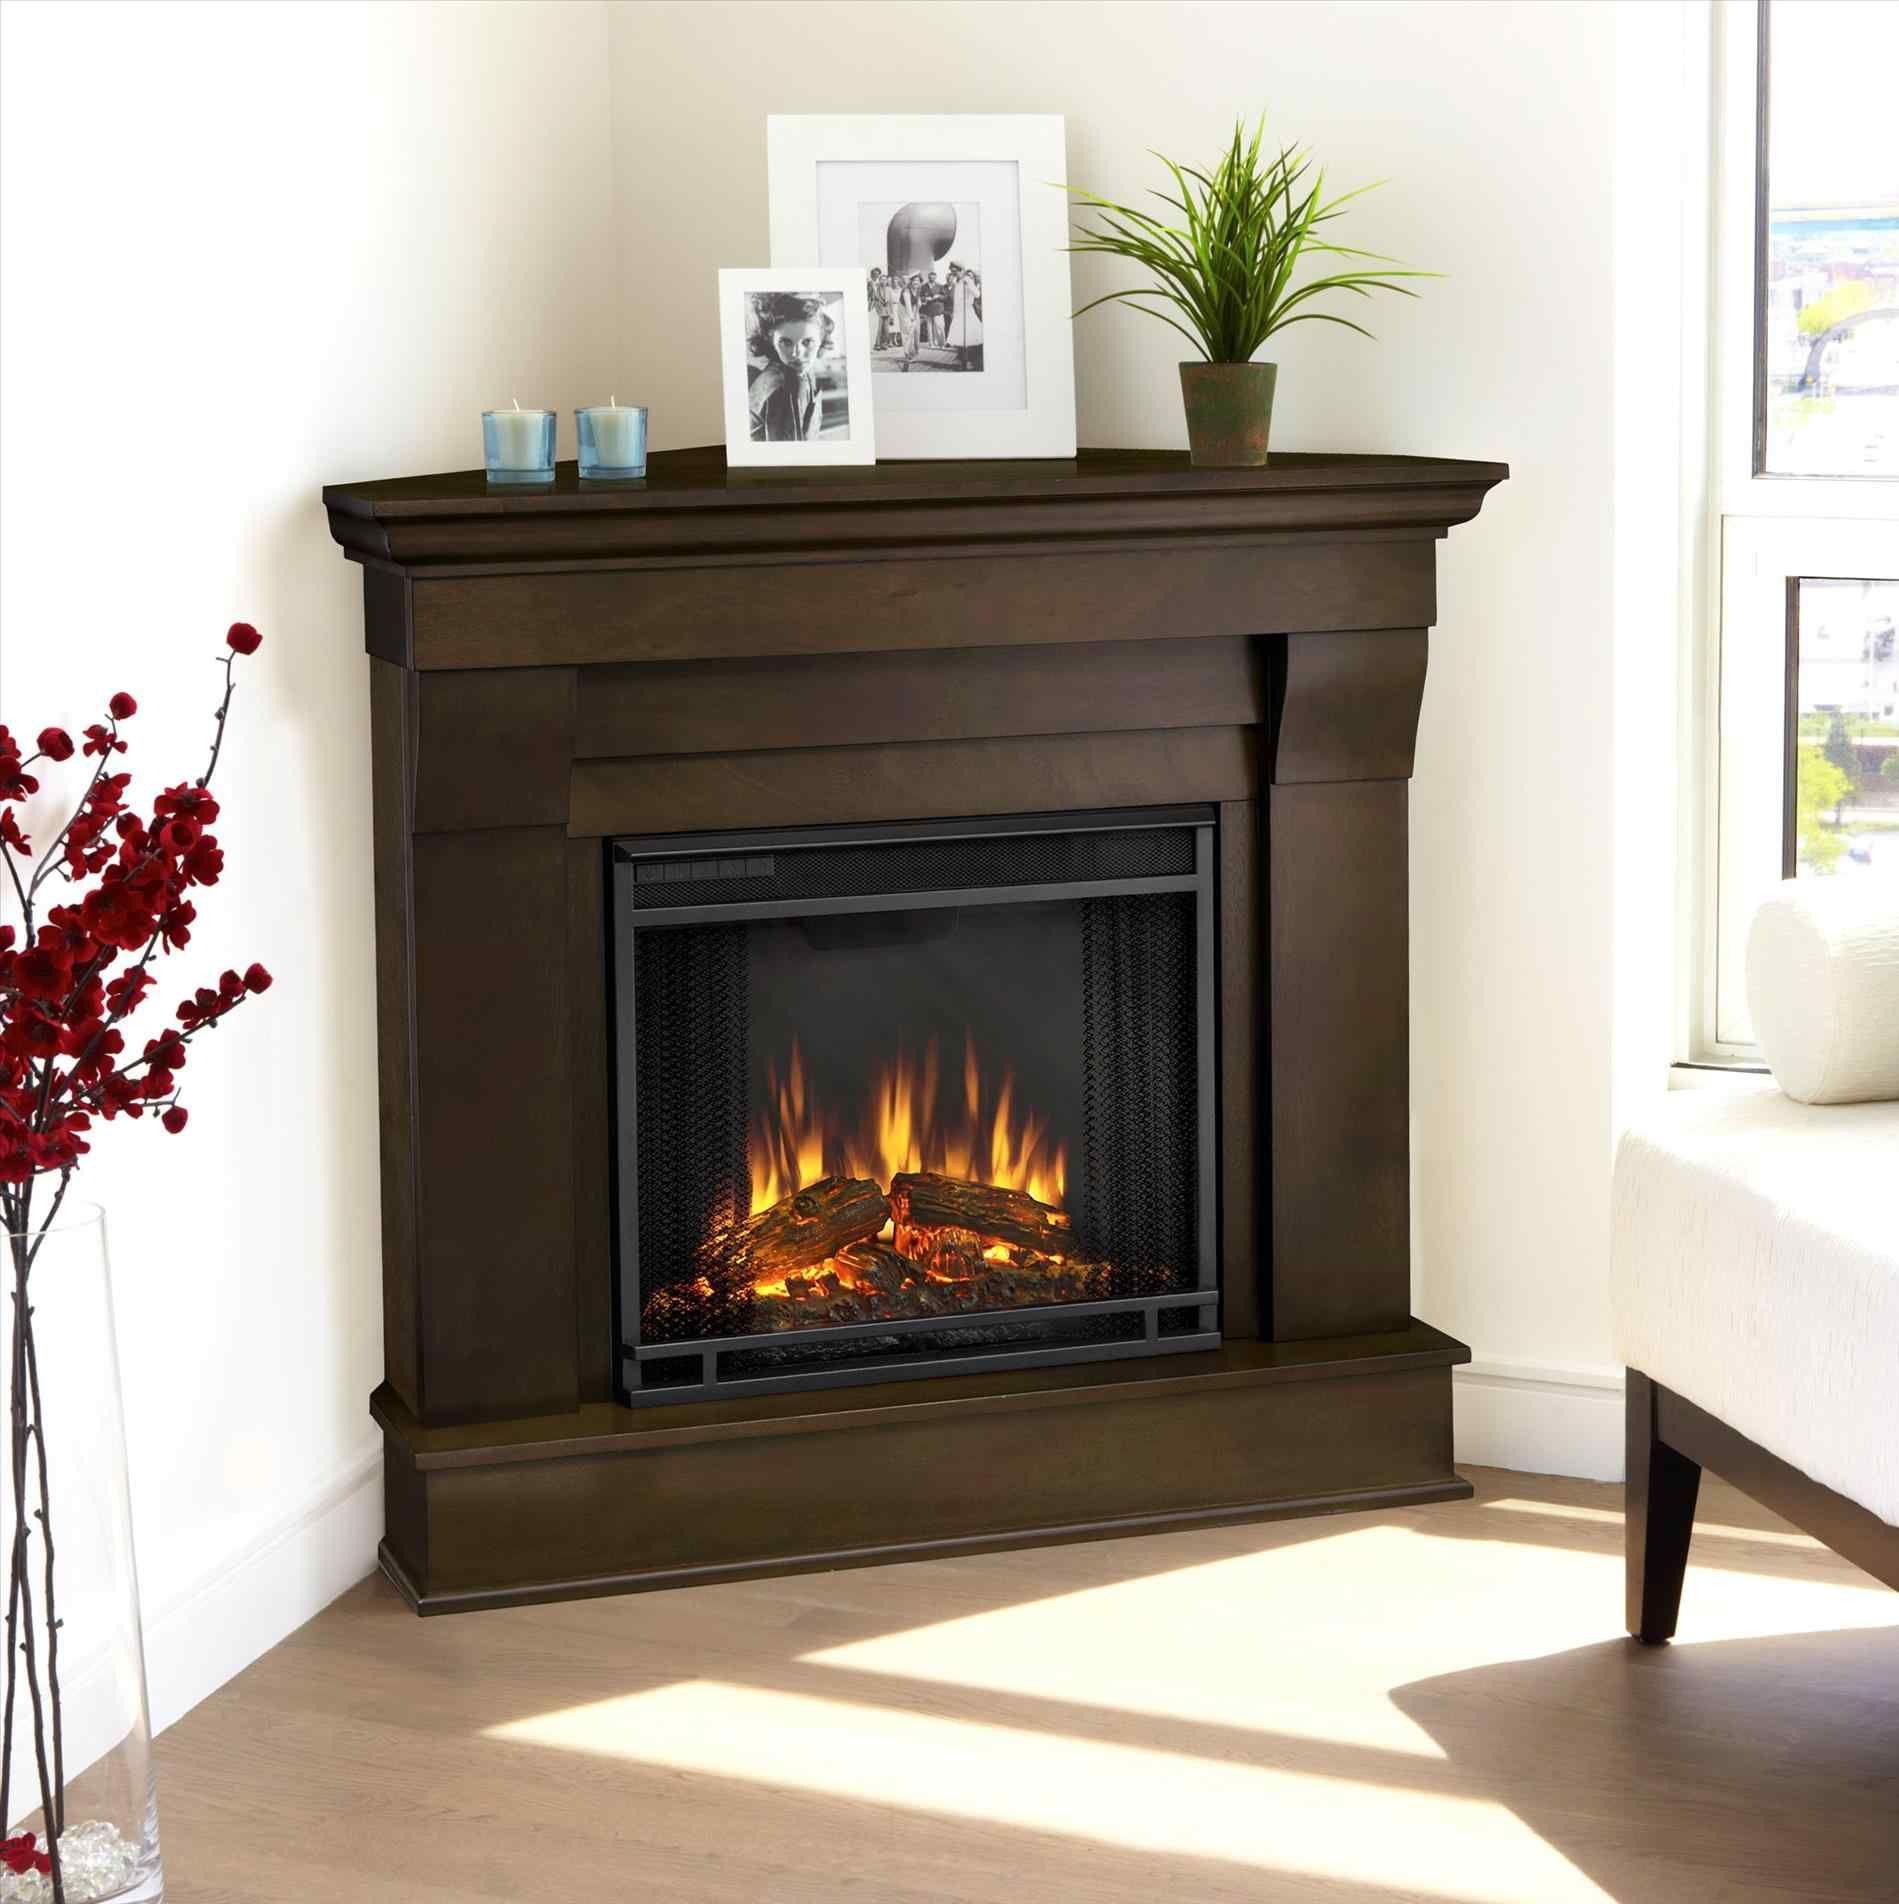 Adding A Fireplace Adding A Fireplace To A House Artificial Fireplace Best Fireplace Inse Corner Gas Fireplace Corner Fireplace Decor Corner Electric Fireplace